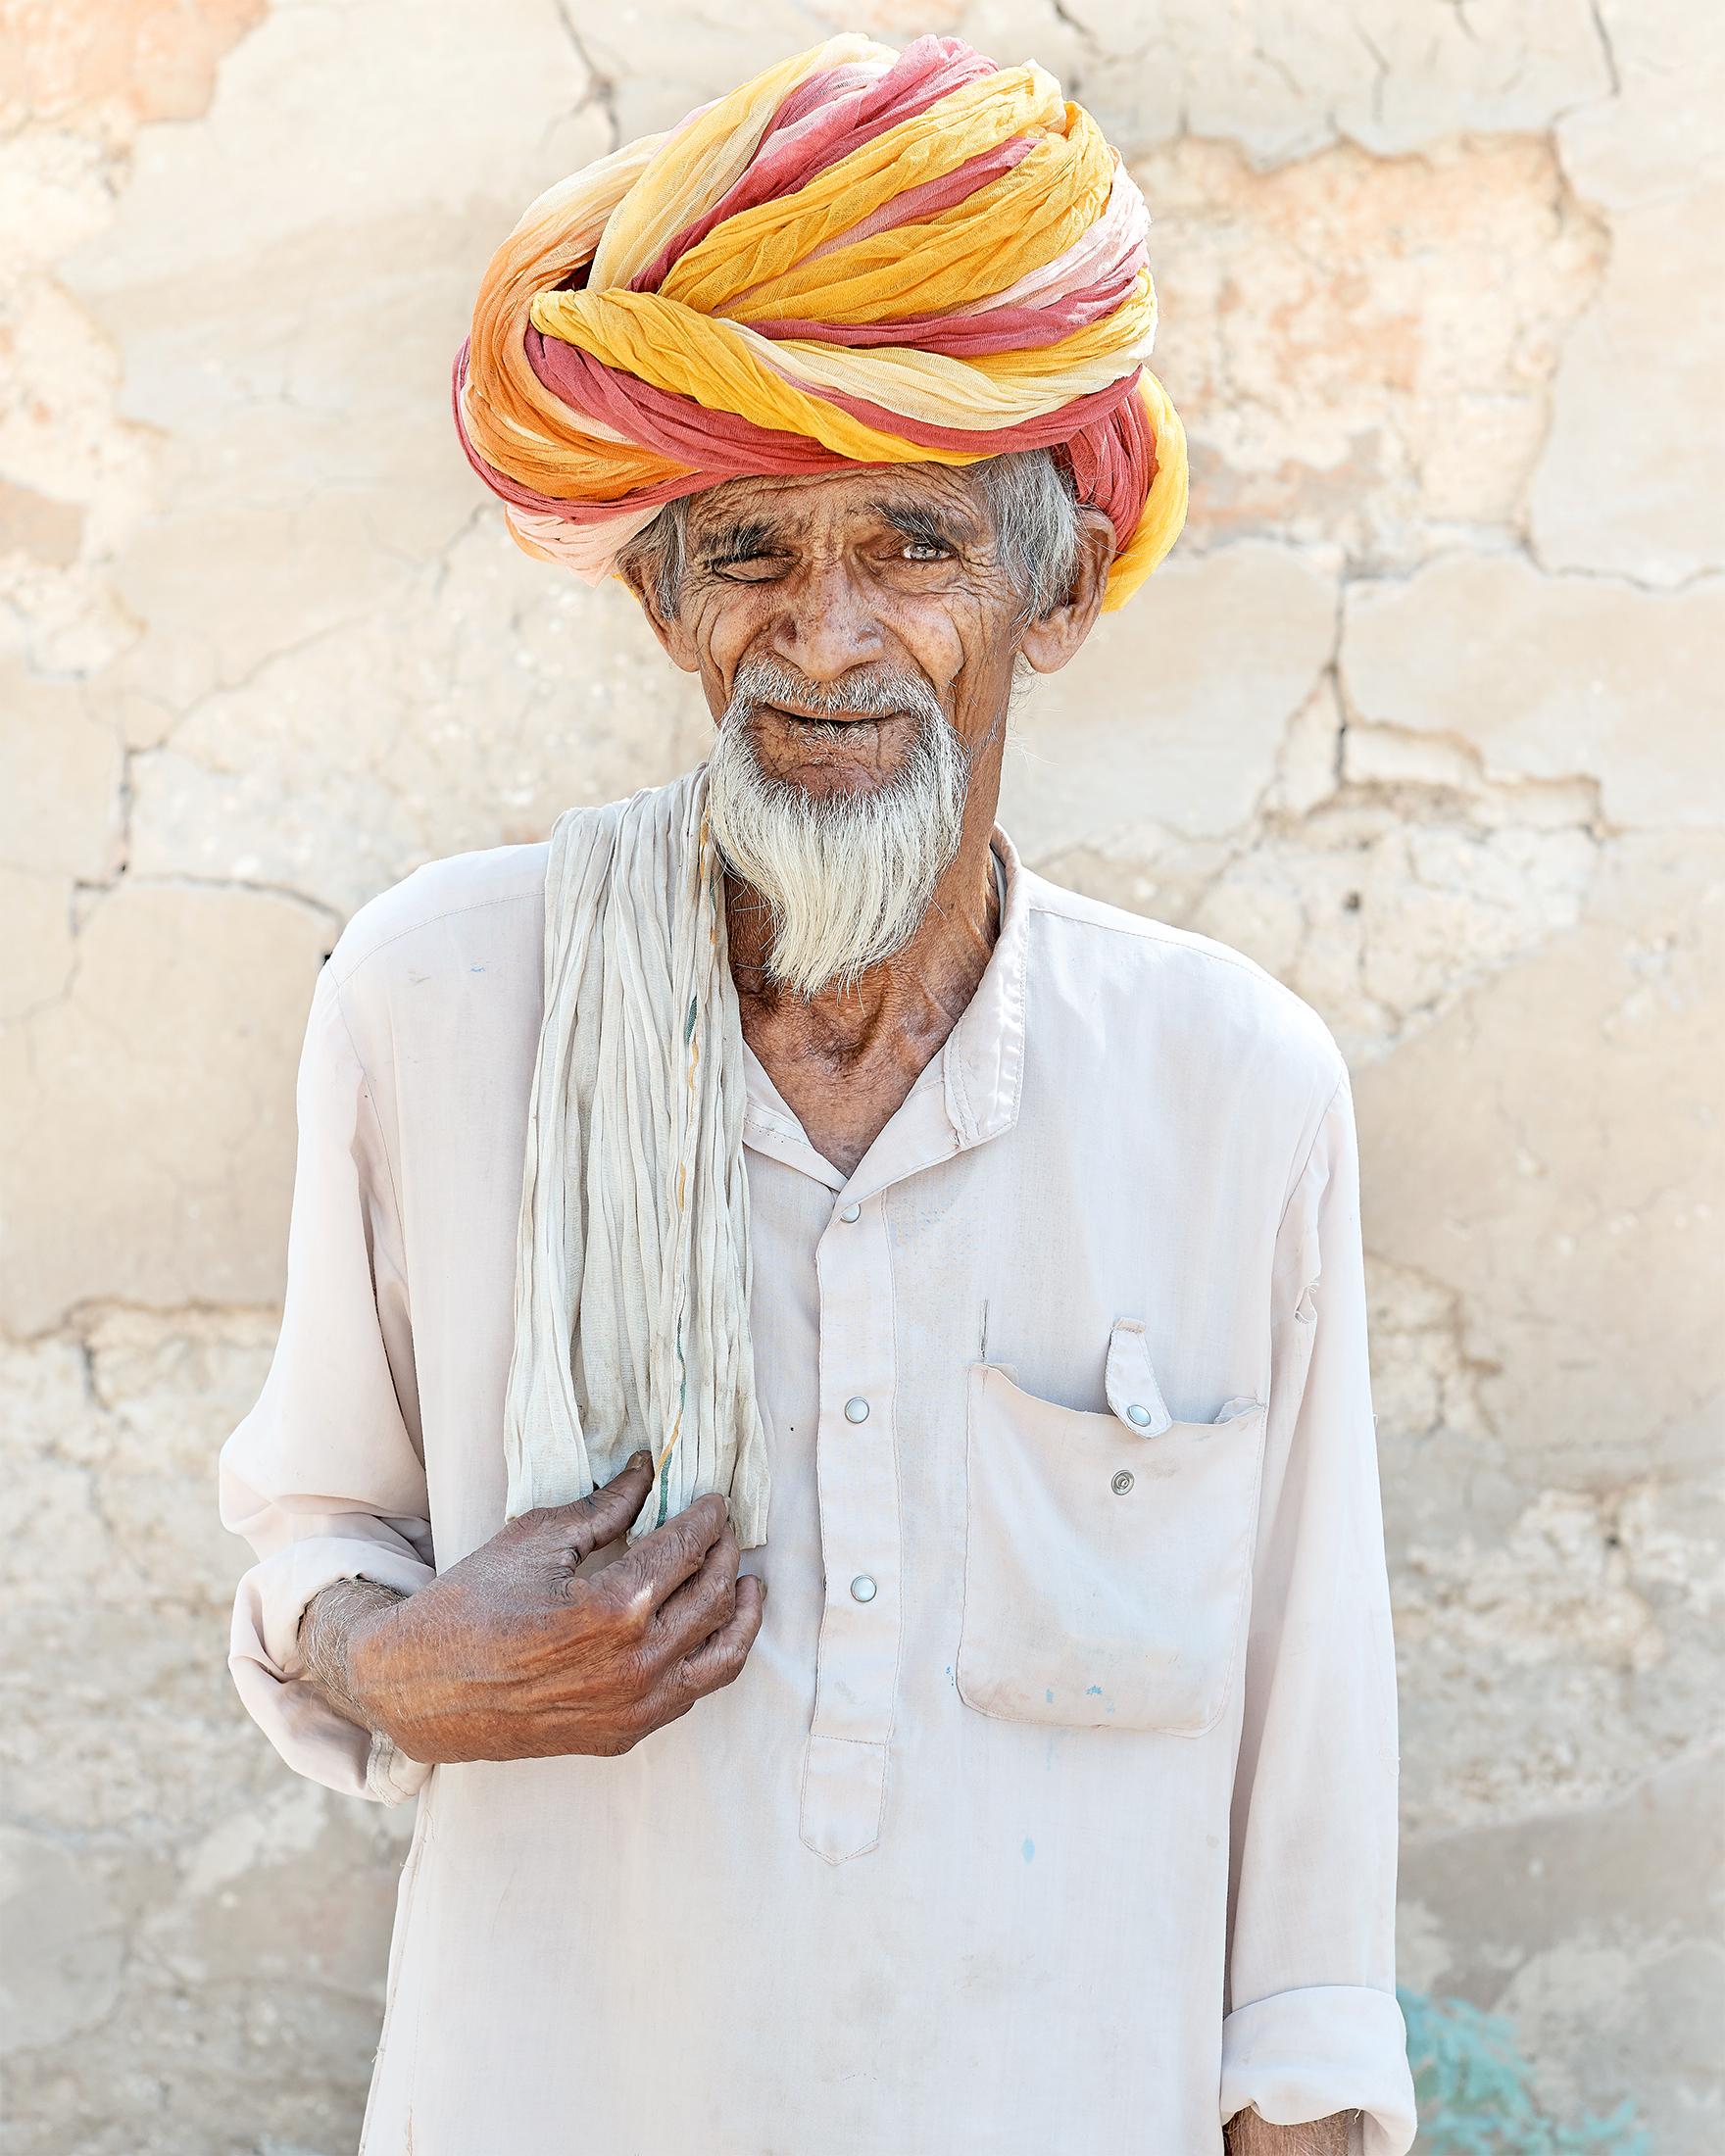 Local, Jodhpur, India, 2017